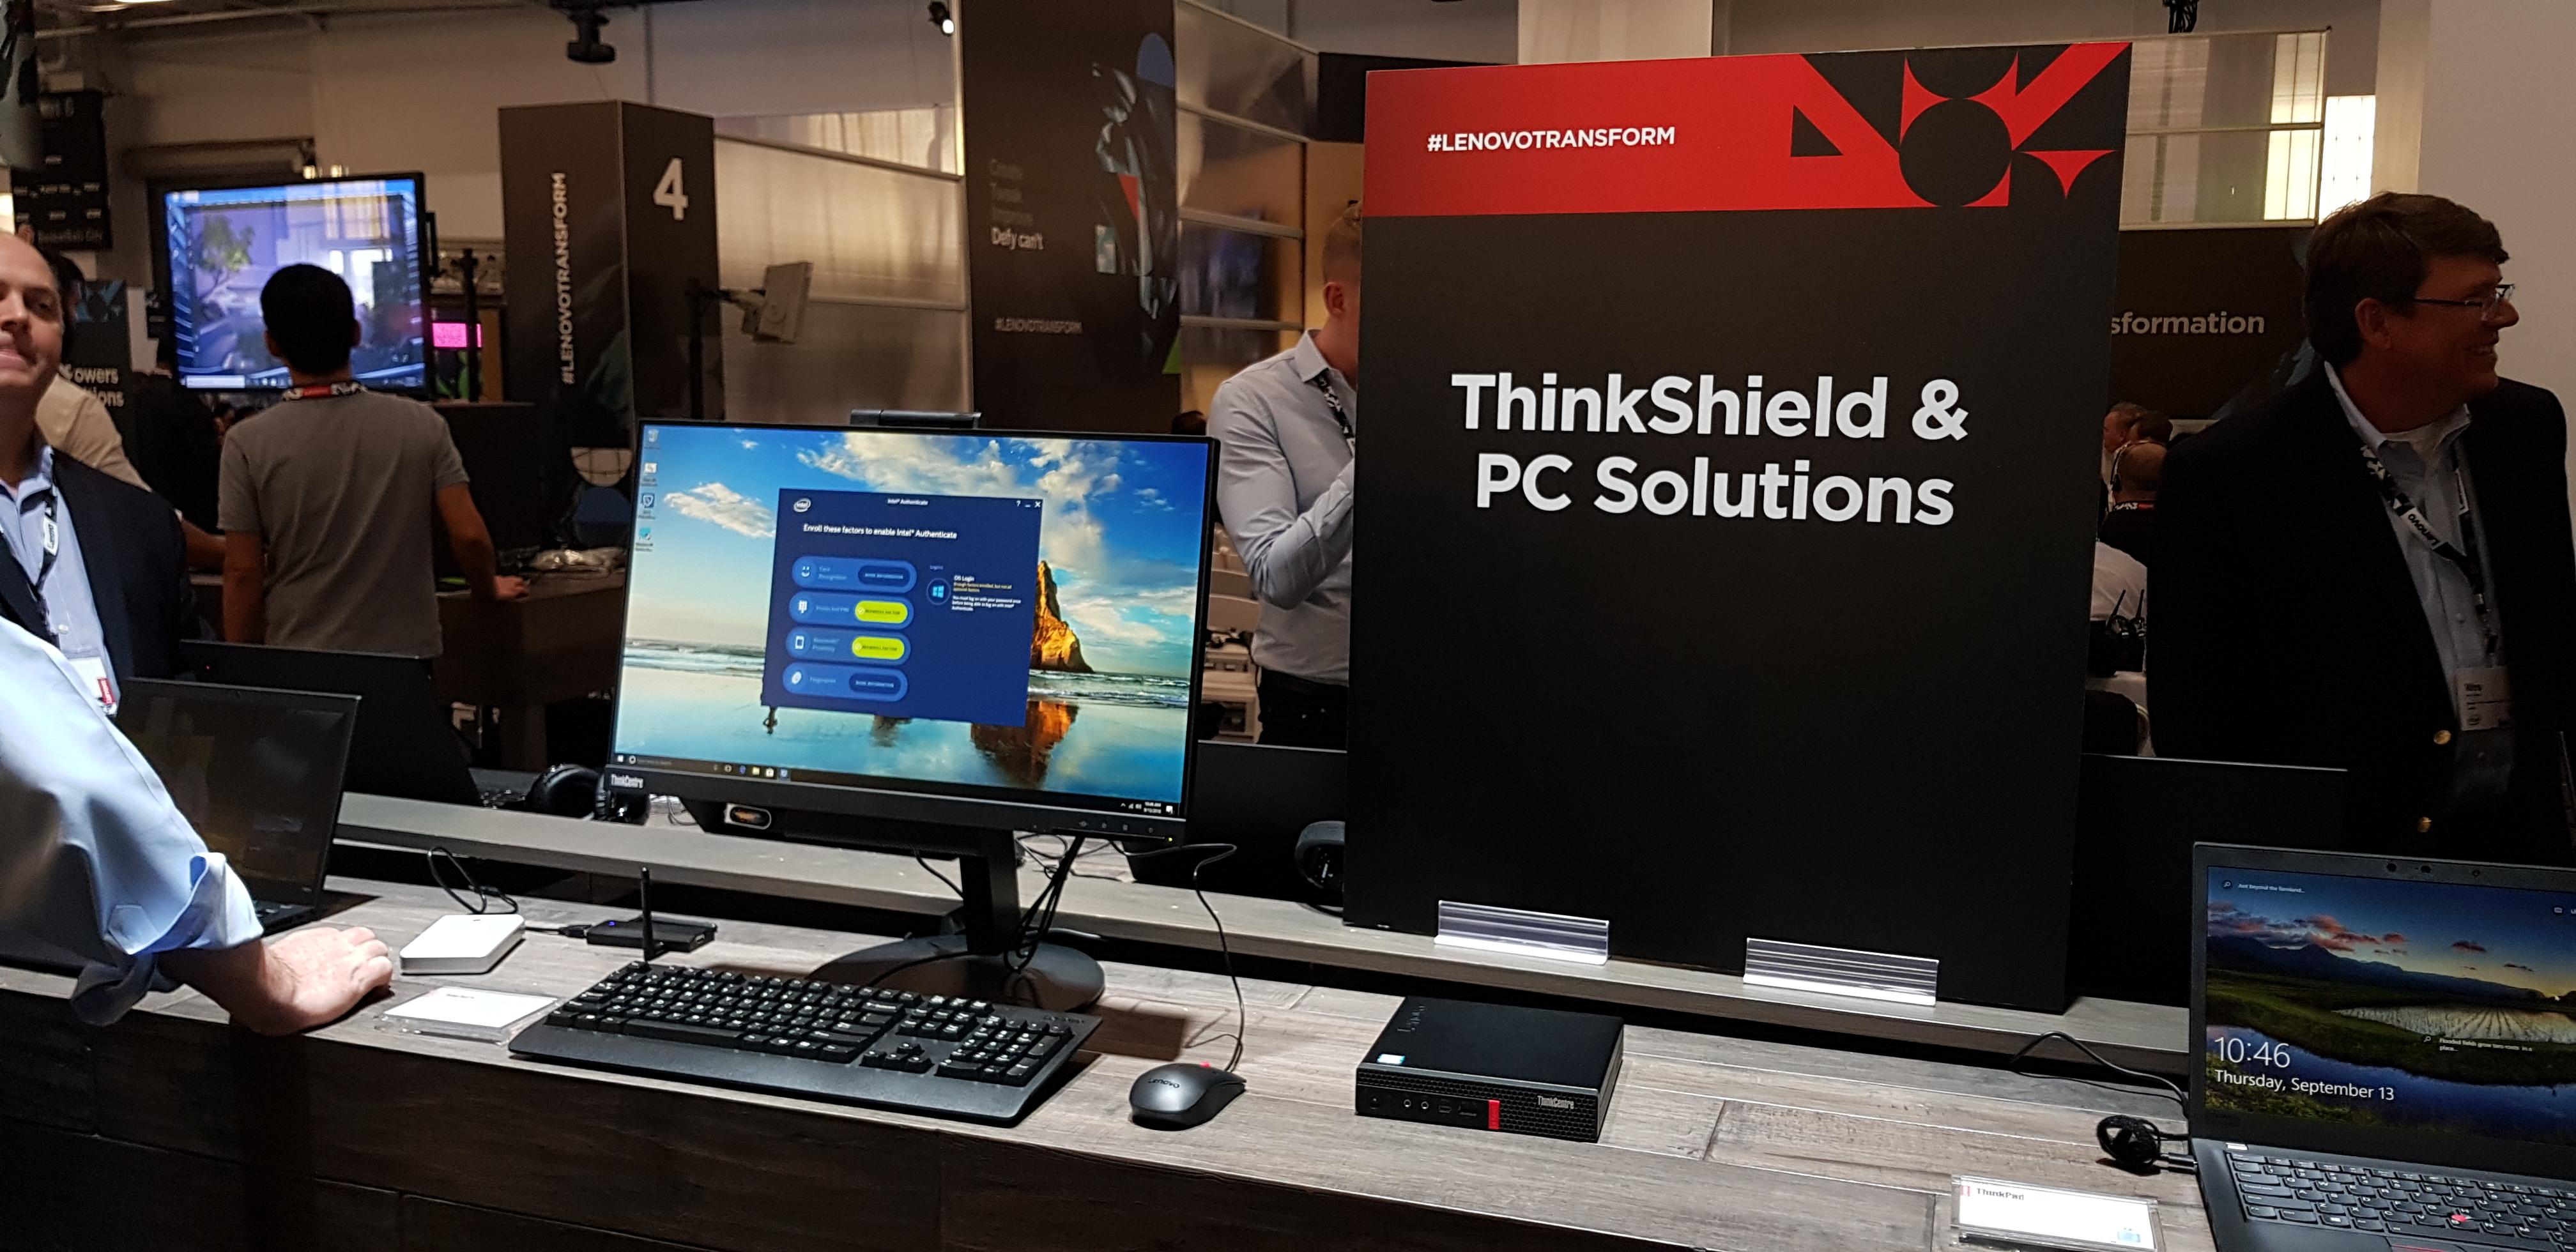 Lenovo unveils ThinkShield to ramp up enterprise security